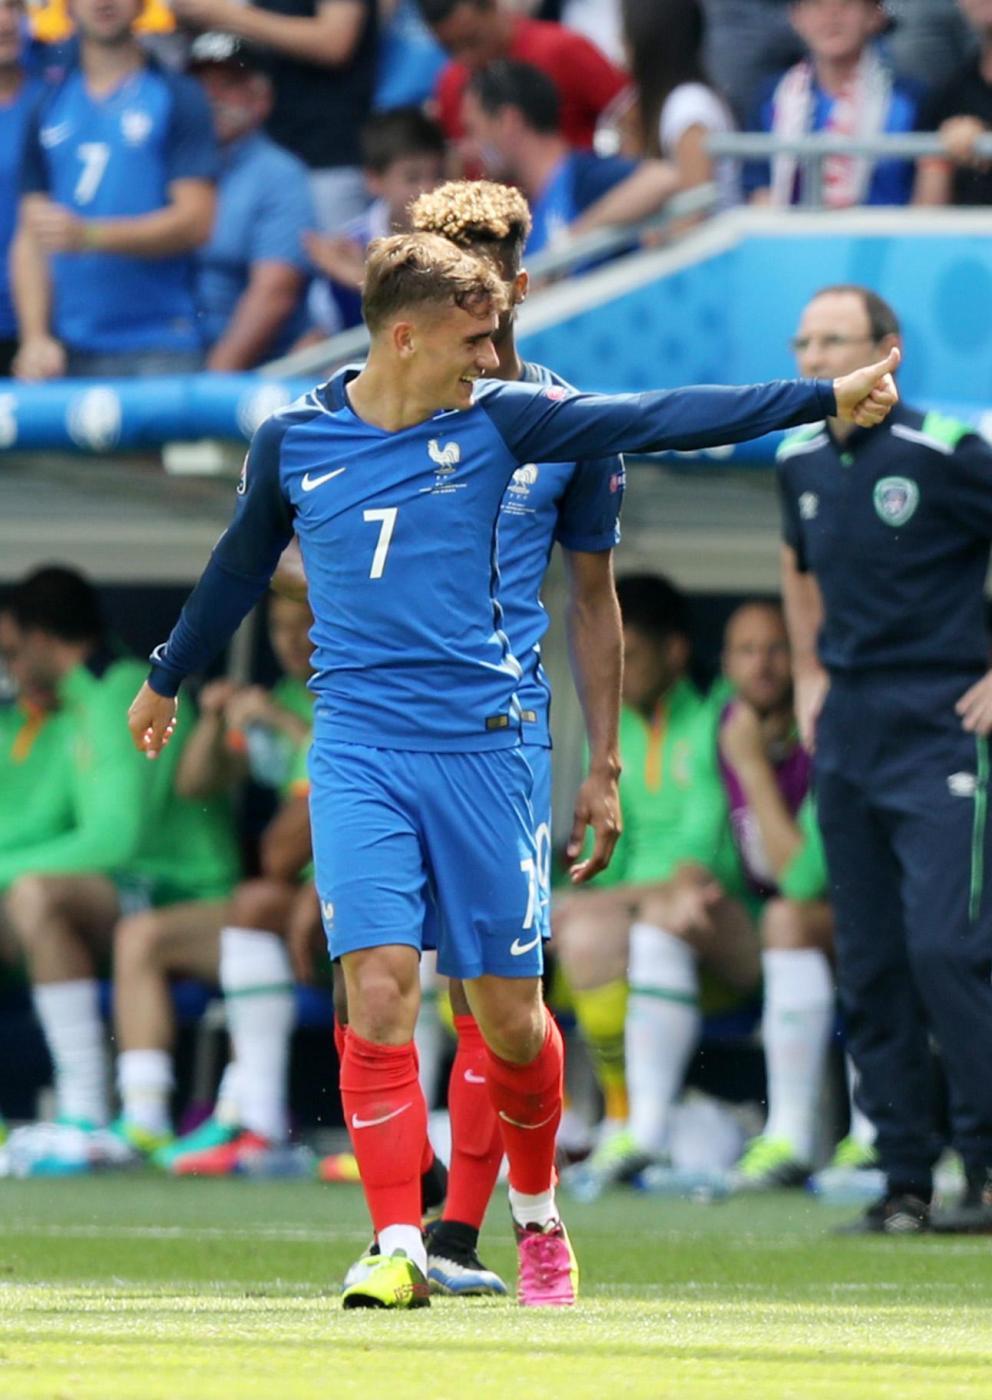 francia- islanda - photo #39